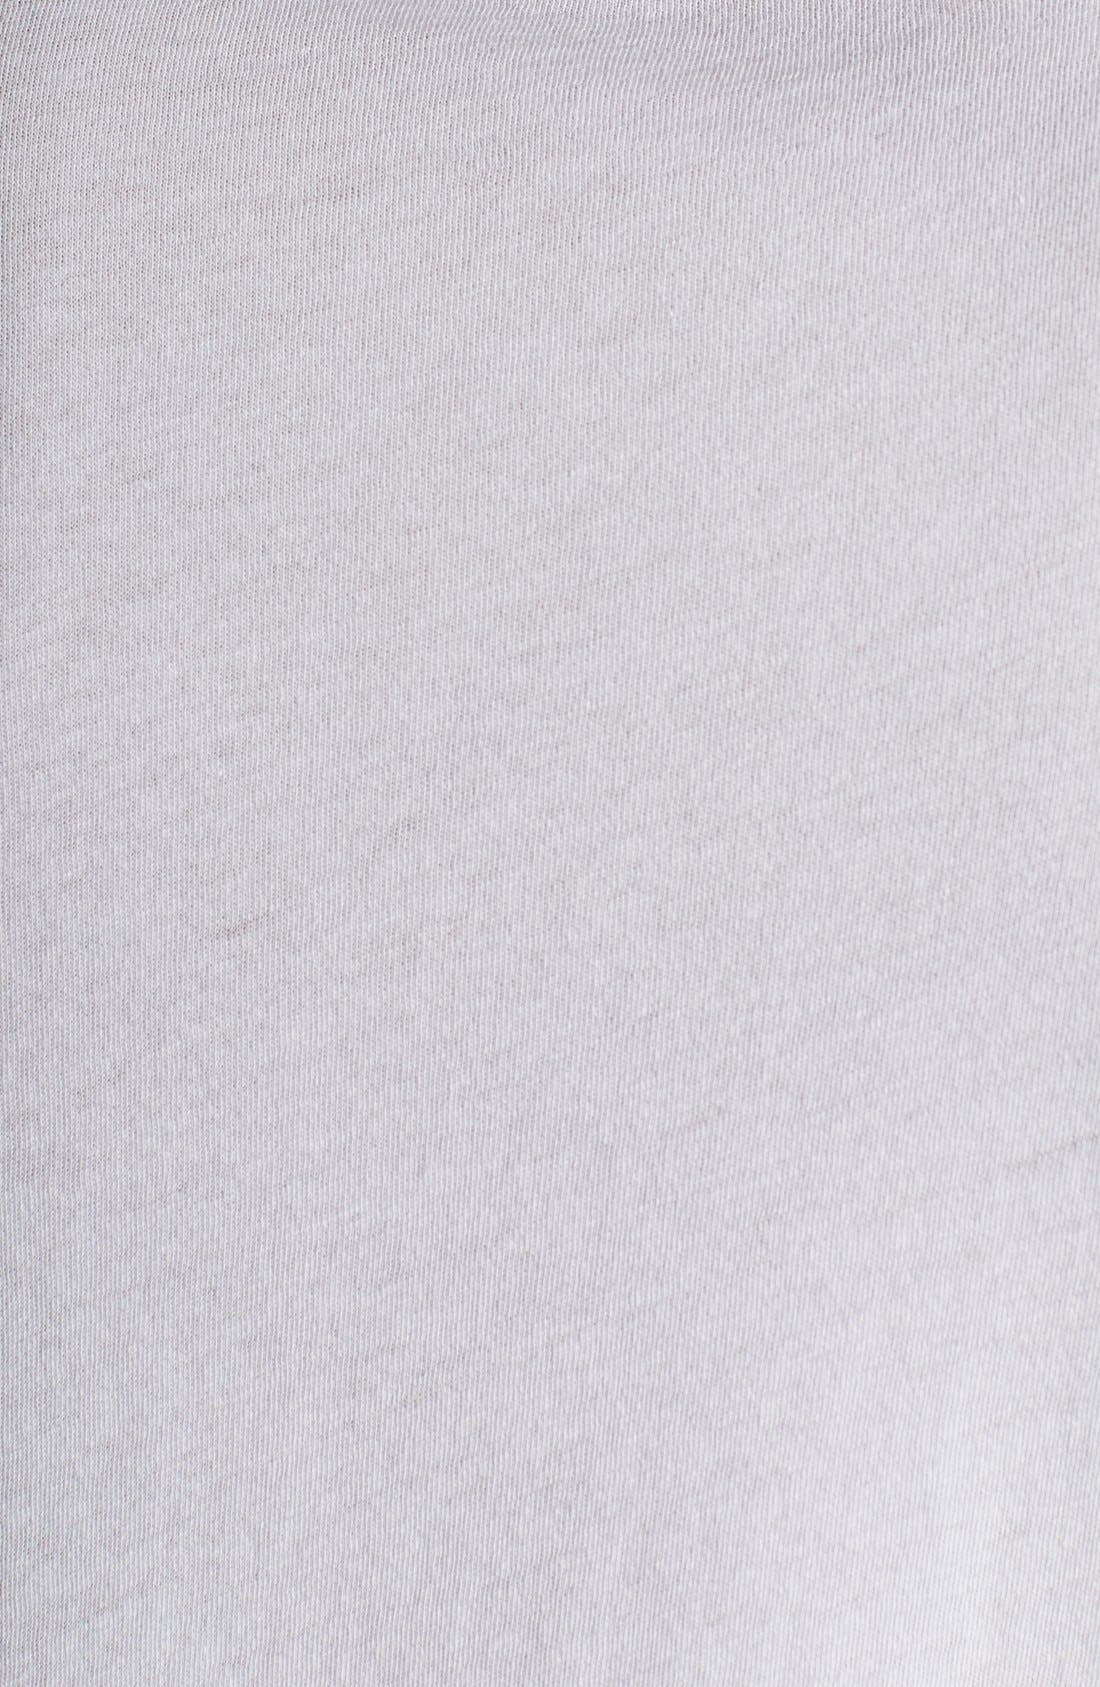 ONLY HEARTS,                             Organic Cotton Shorts Pajamas,                             Alternate thumbnail 2, color,                             400